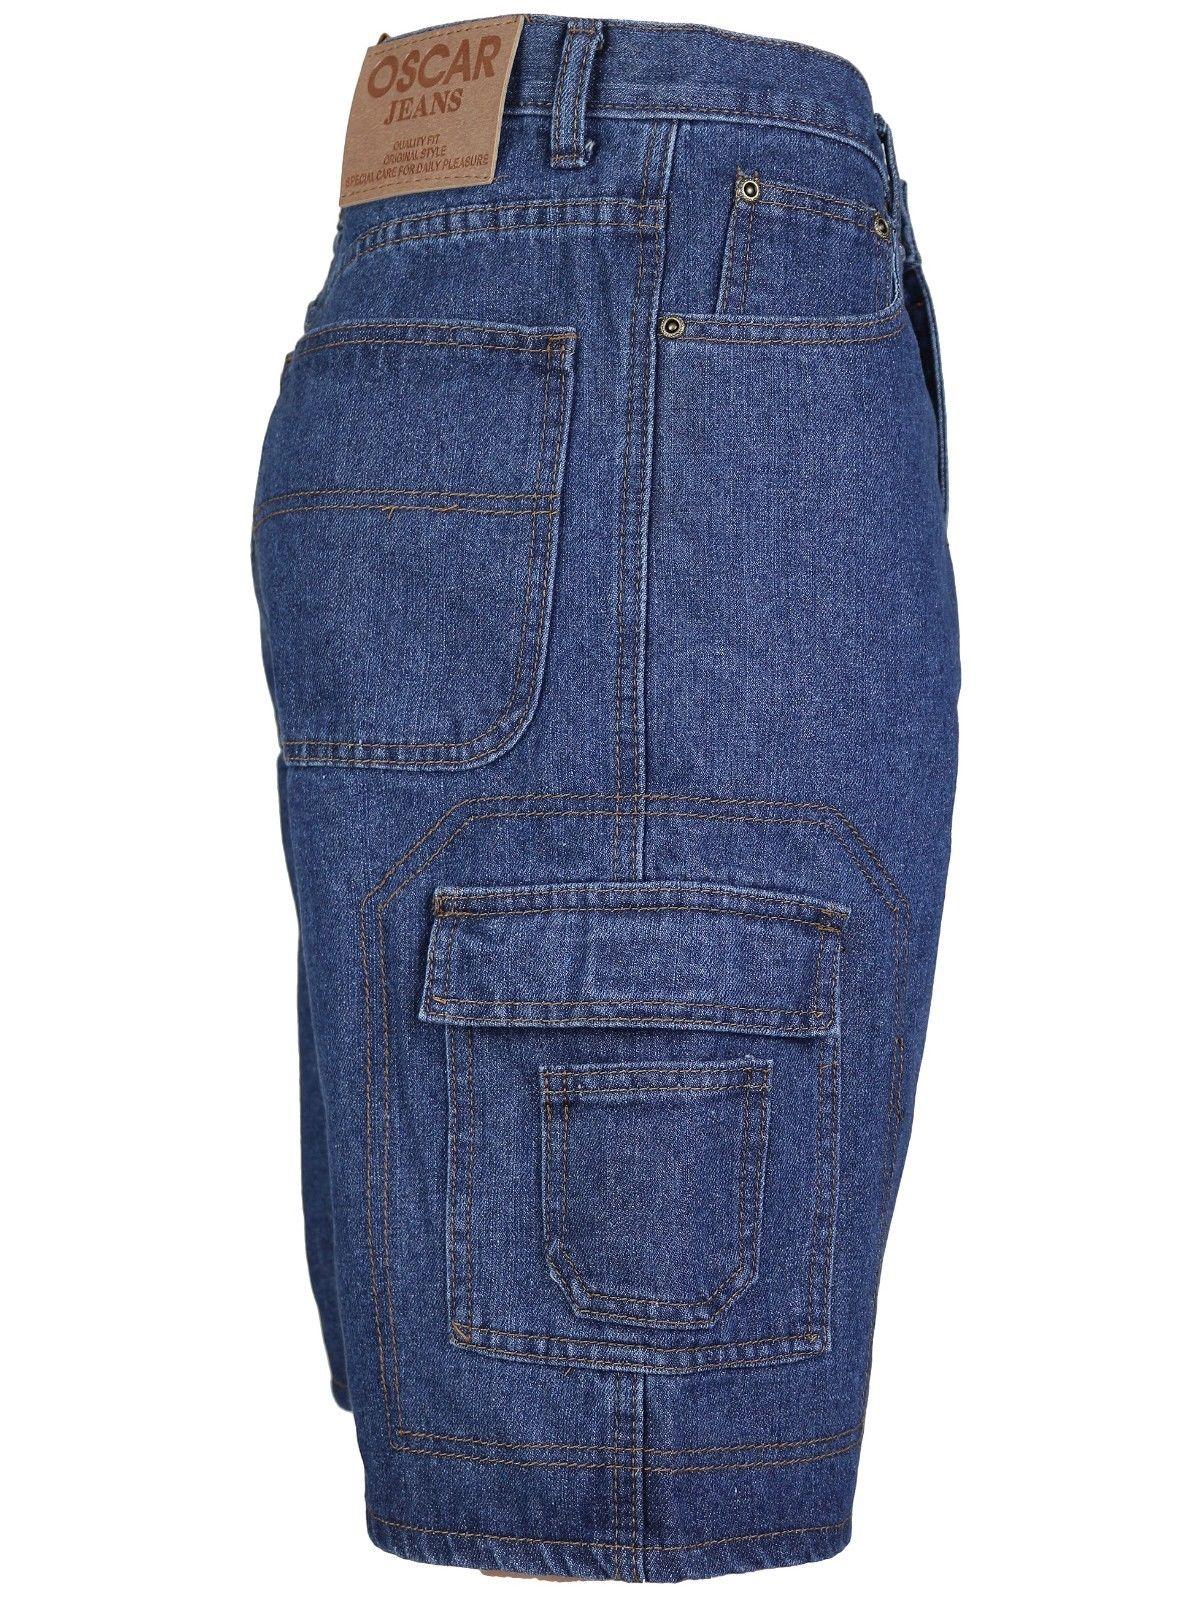 Men-039-s-Premium-Cotton-Multi-Pocket-Relaxed-Fit-Stonewash-Denim-Jean-Cargo-Shorts thumbnail 17